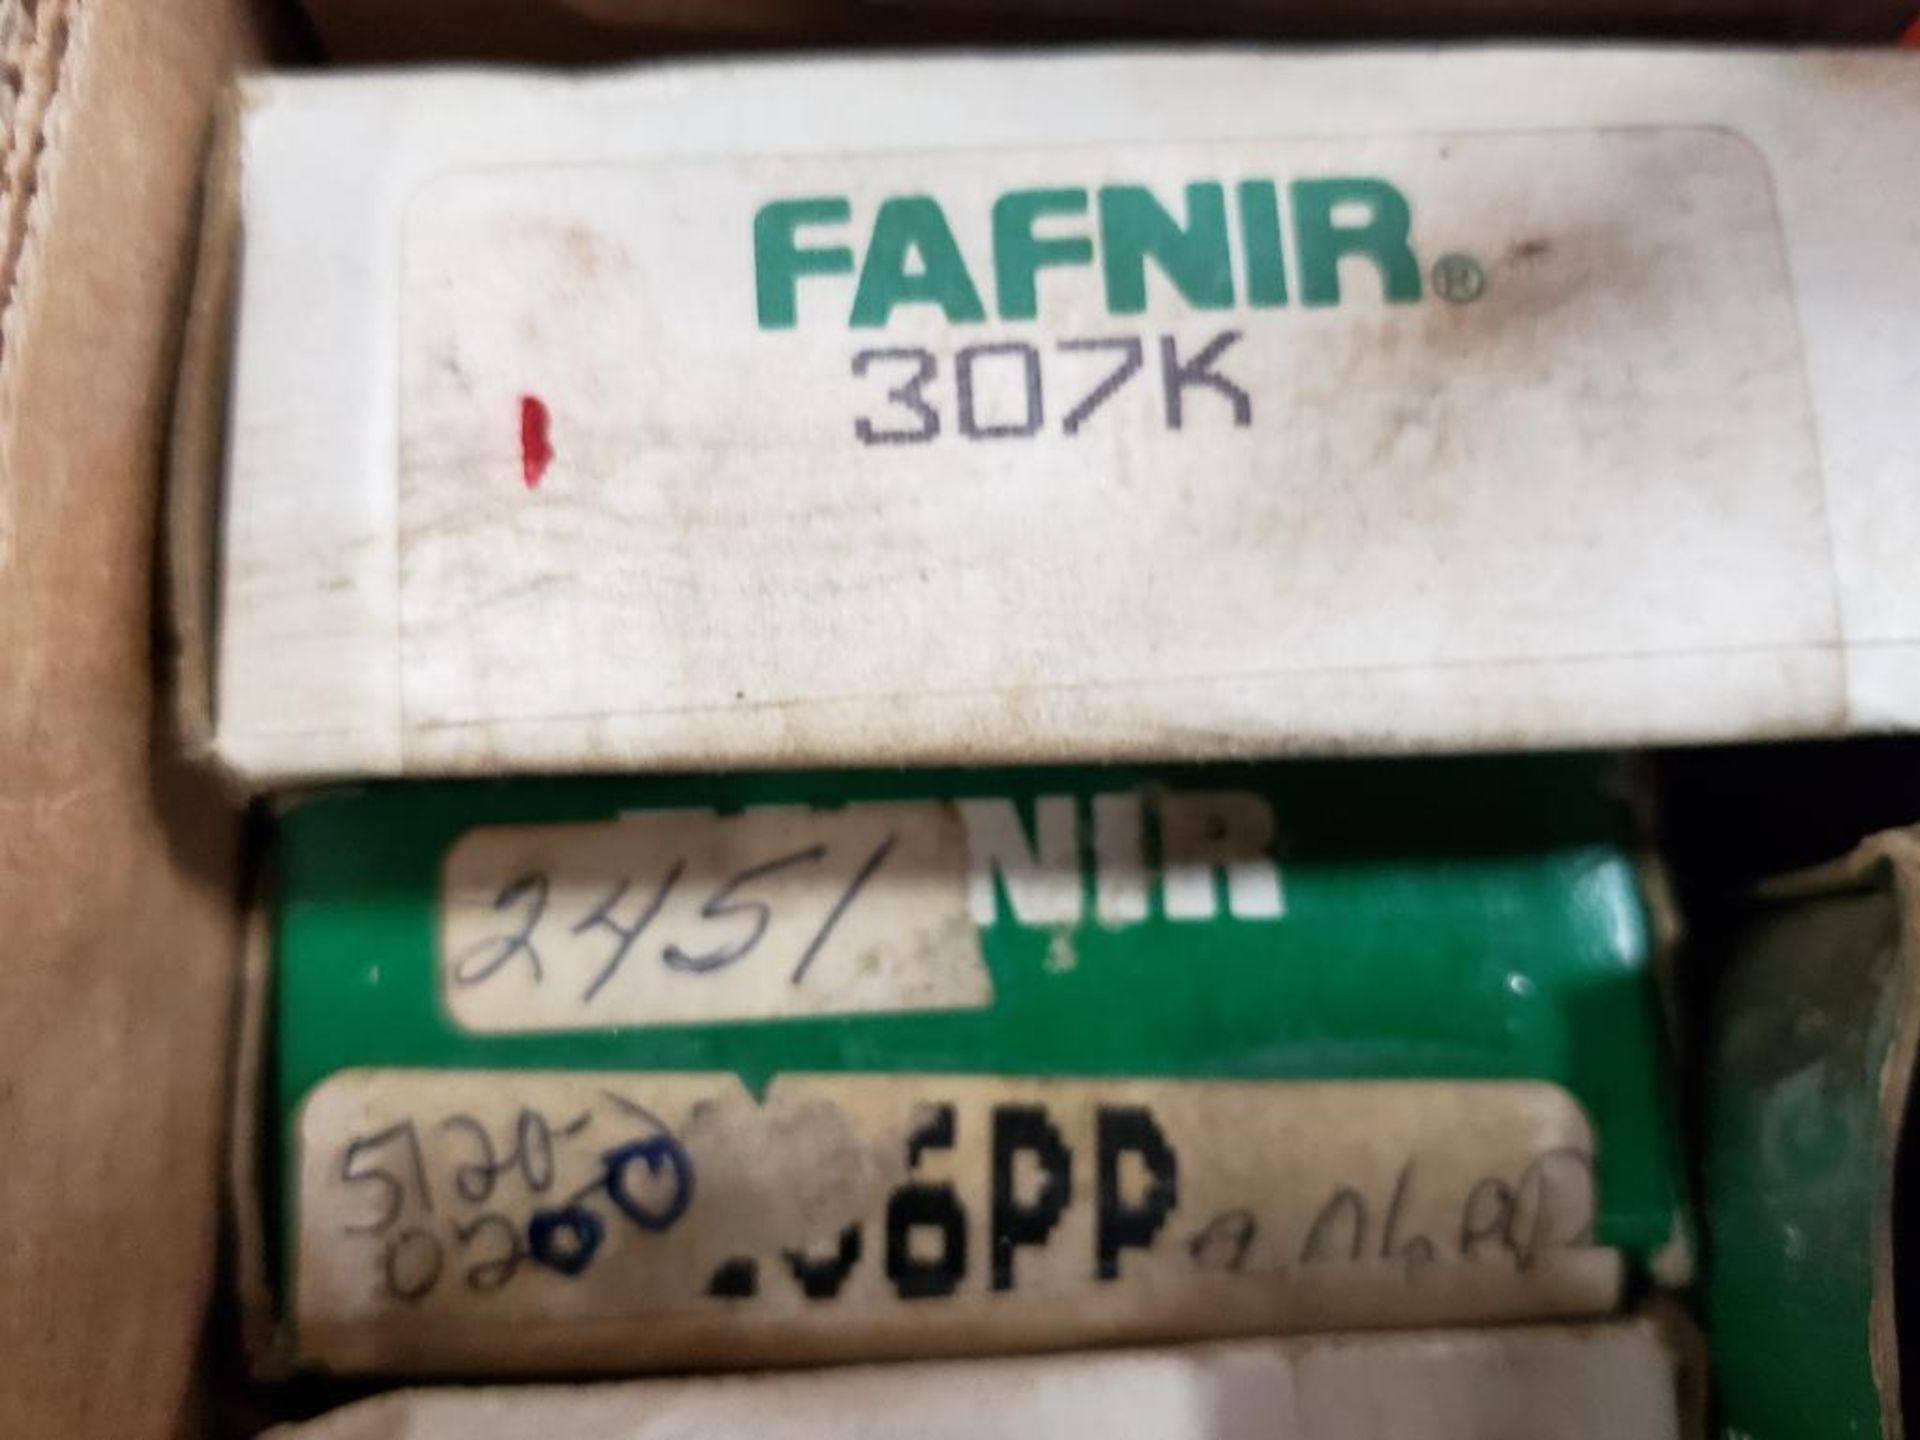 Assorted bearings. INA, Fafnir. - Image 2 of 14